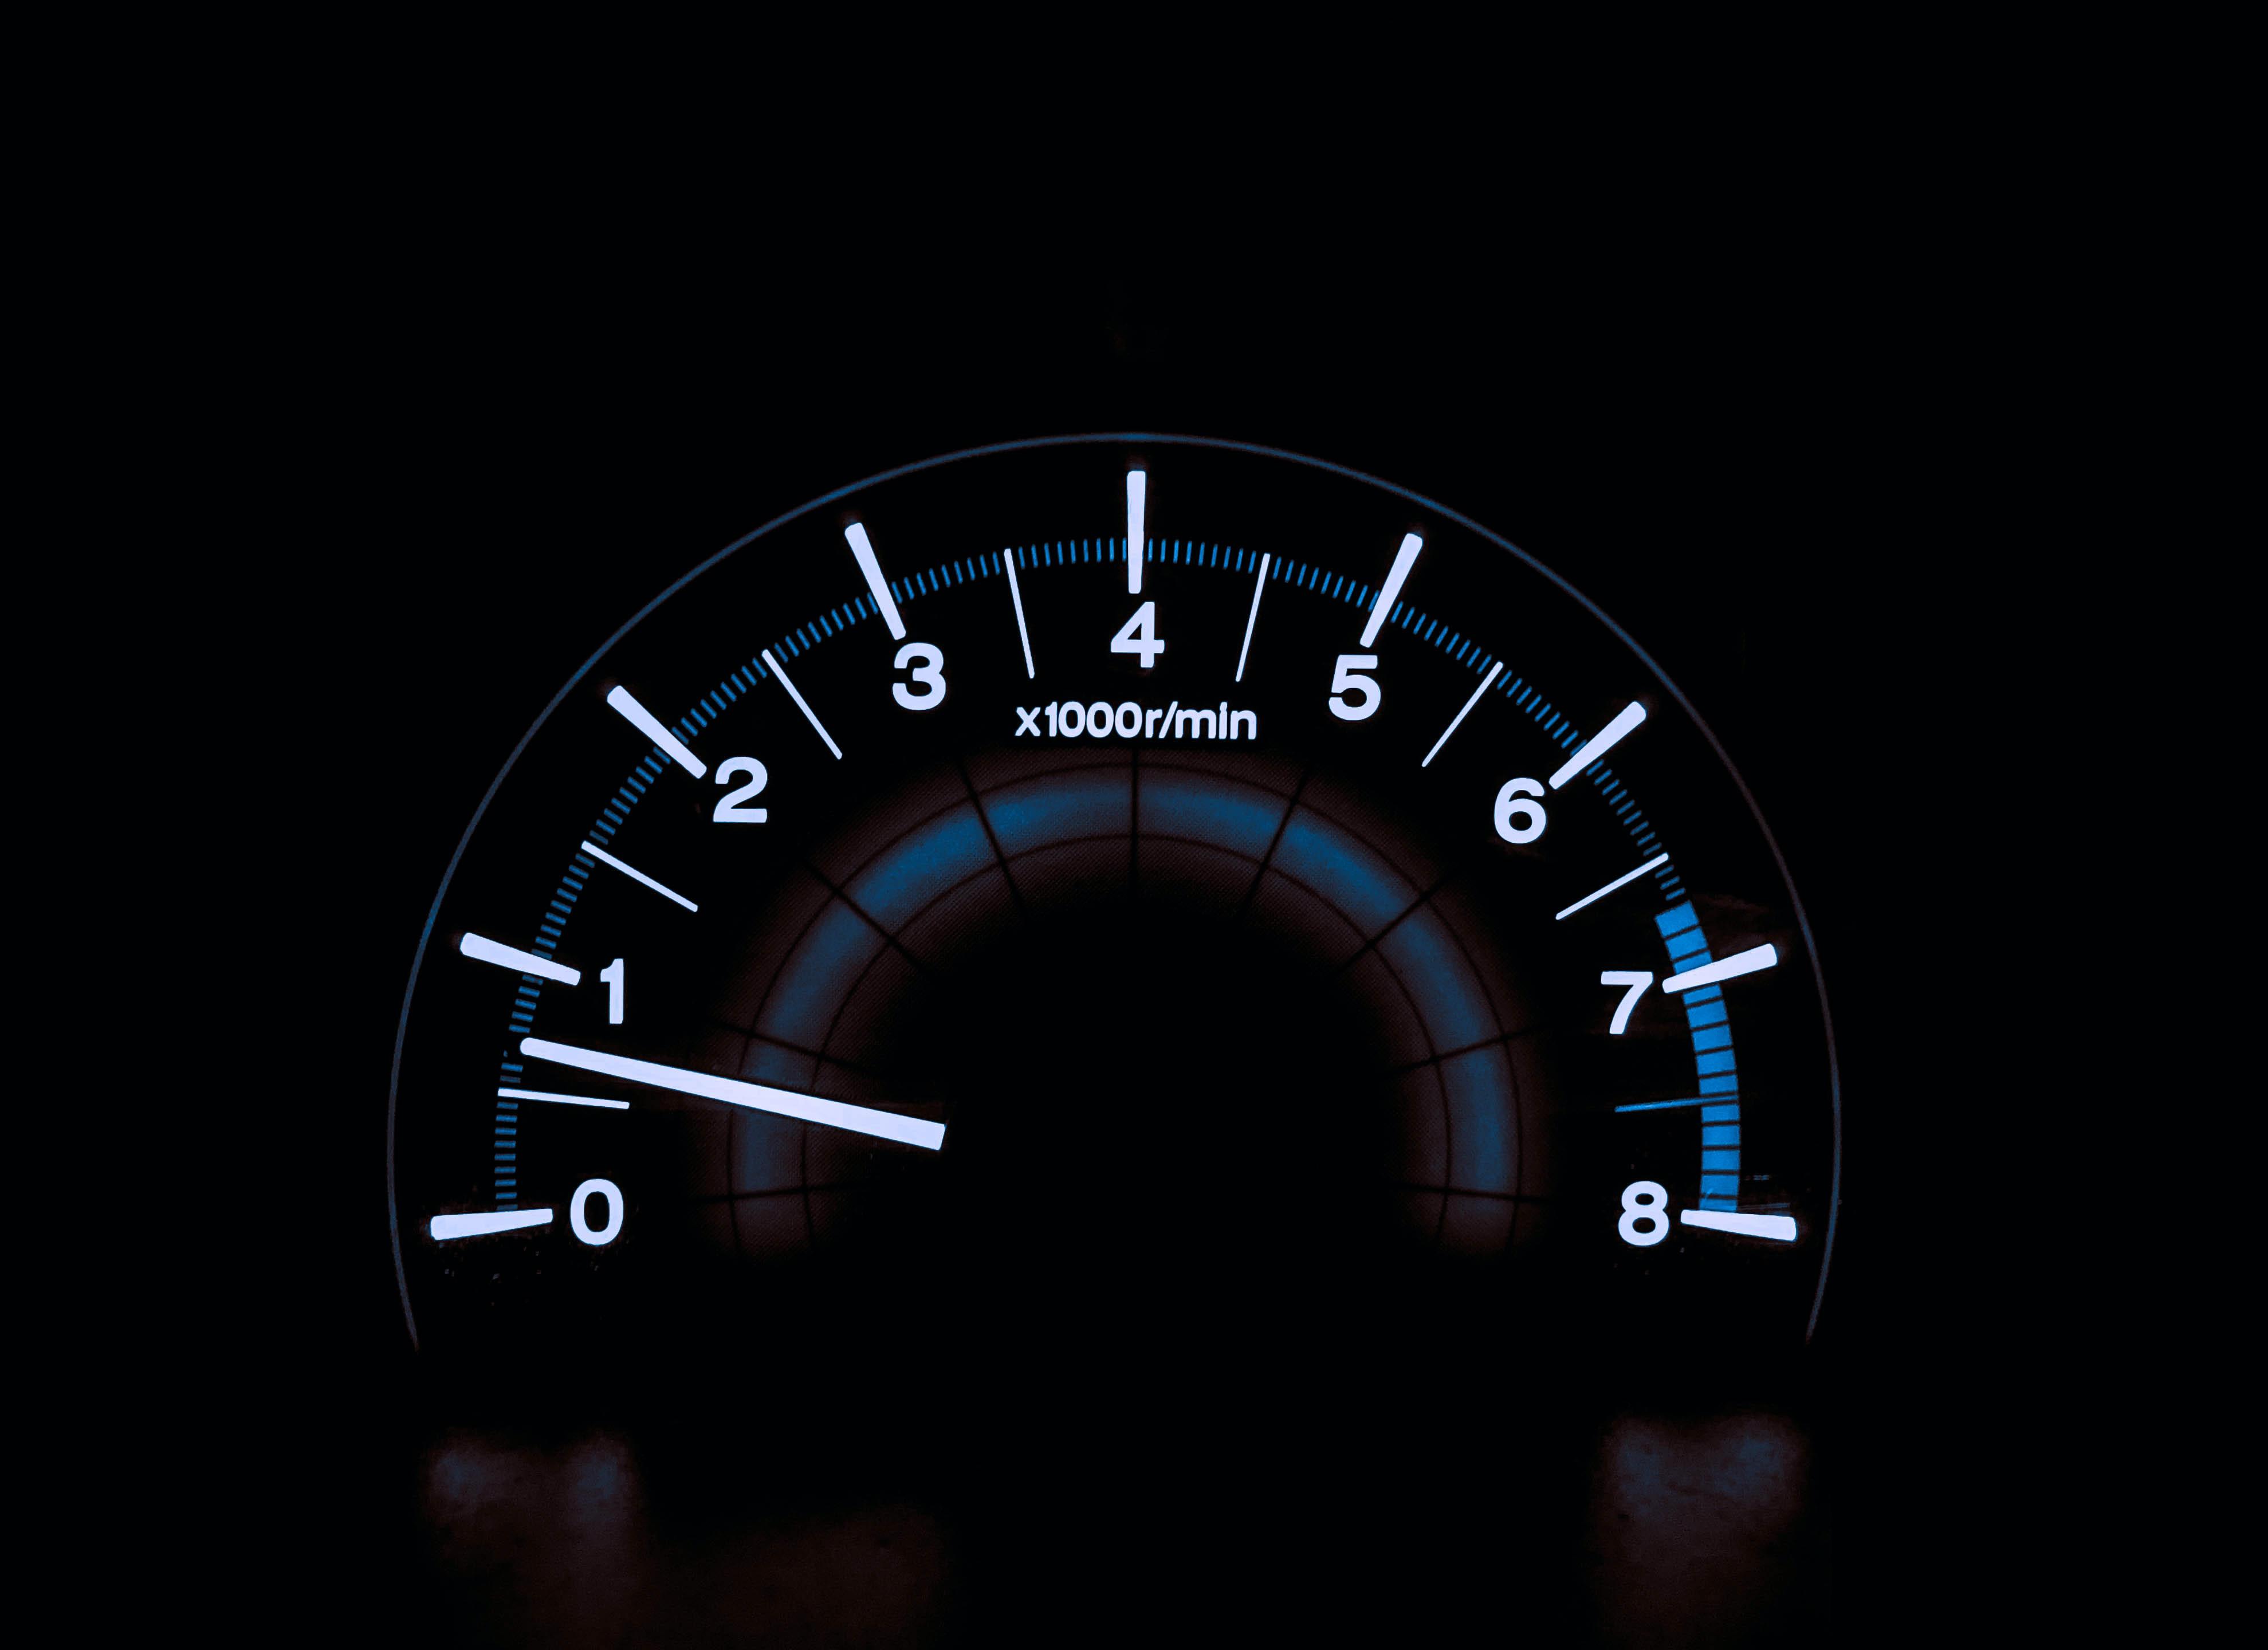 A tachometer at .75.